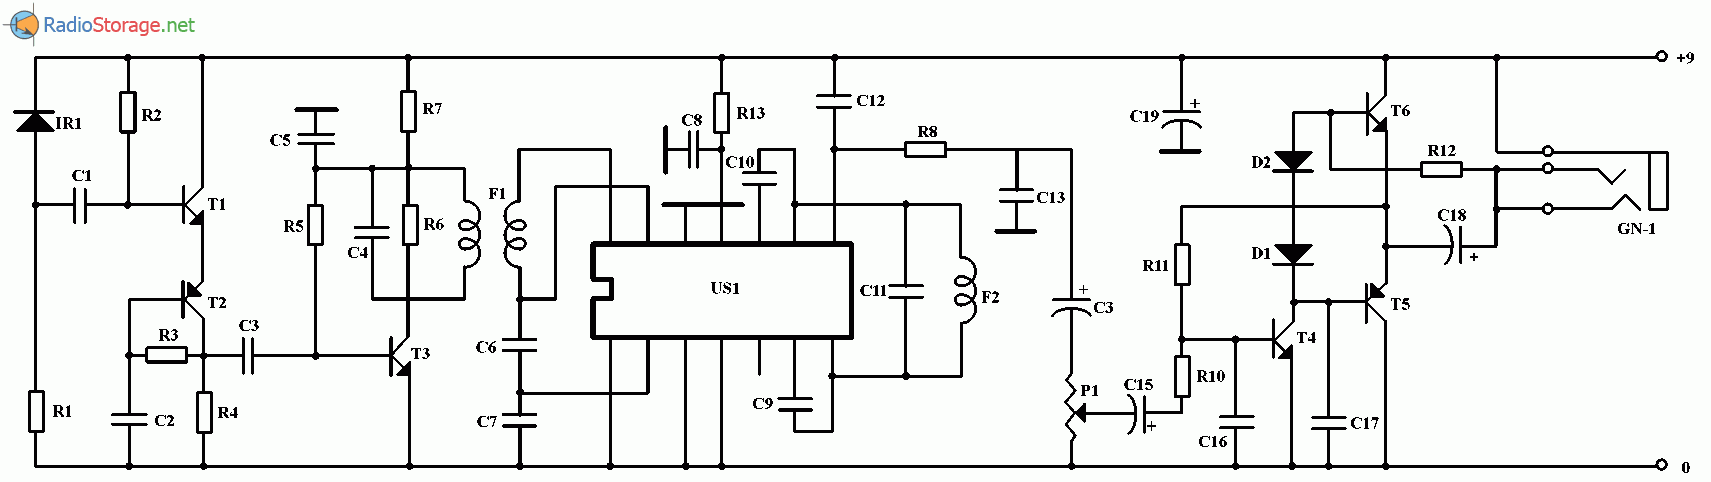 схема беспроводного наушника